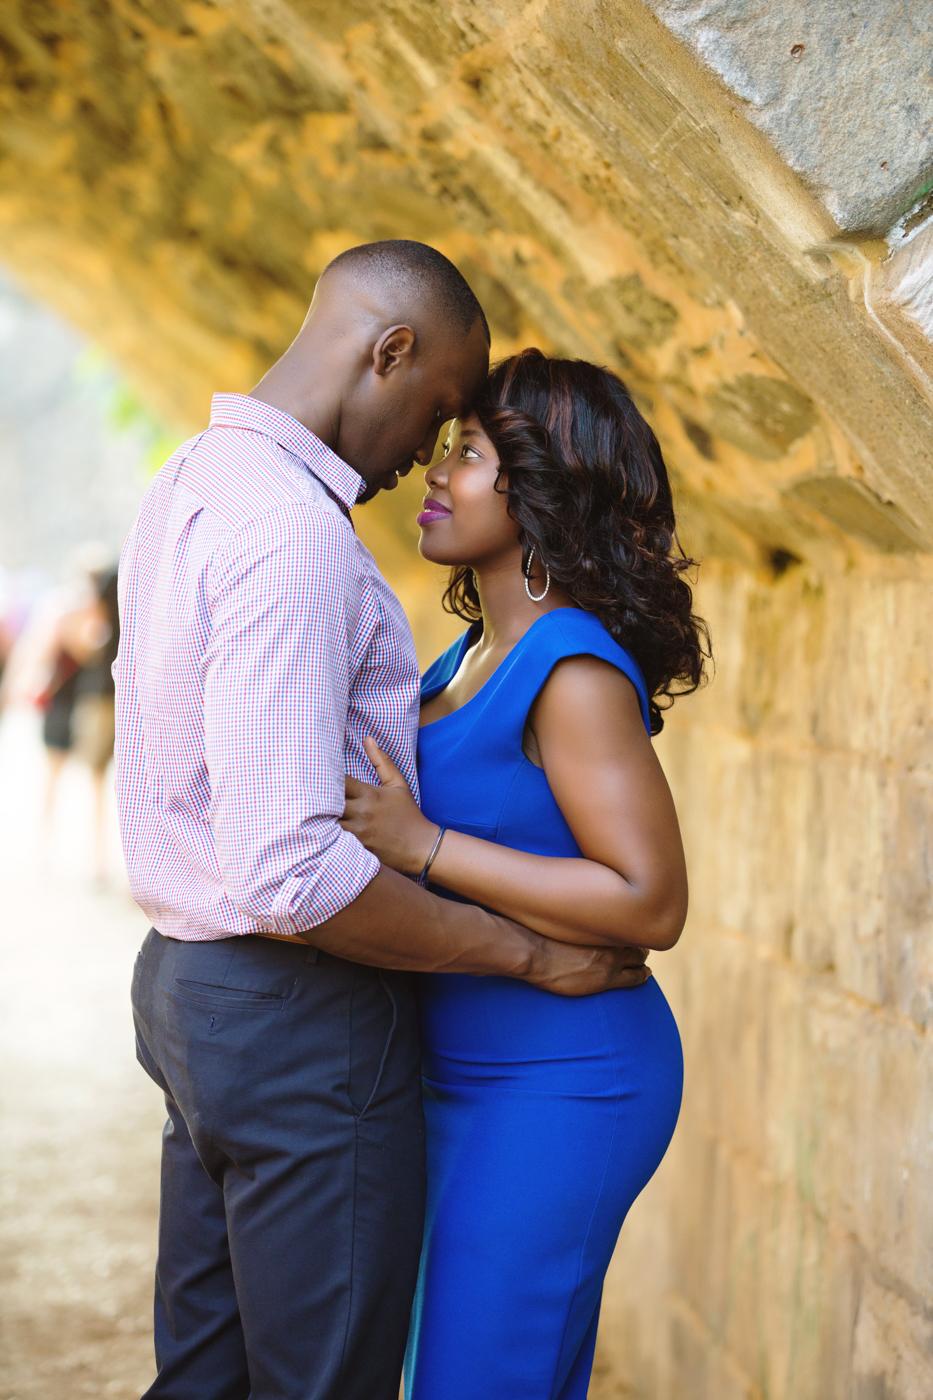 Jessica-Daniel-Engagement-Photo-Shoot-in-the-heart-of-Washington-DC-Ksenia-Pro-Photography-8